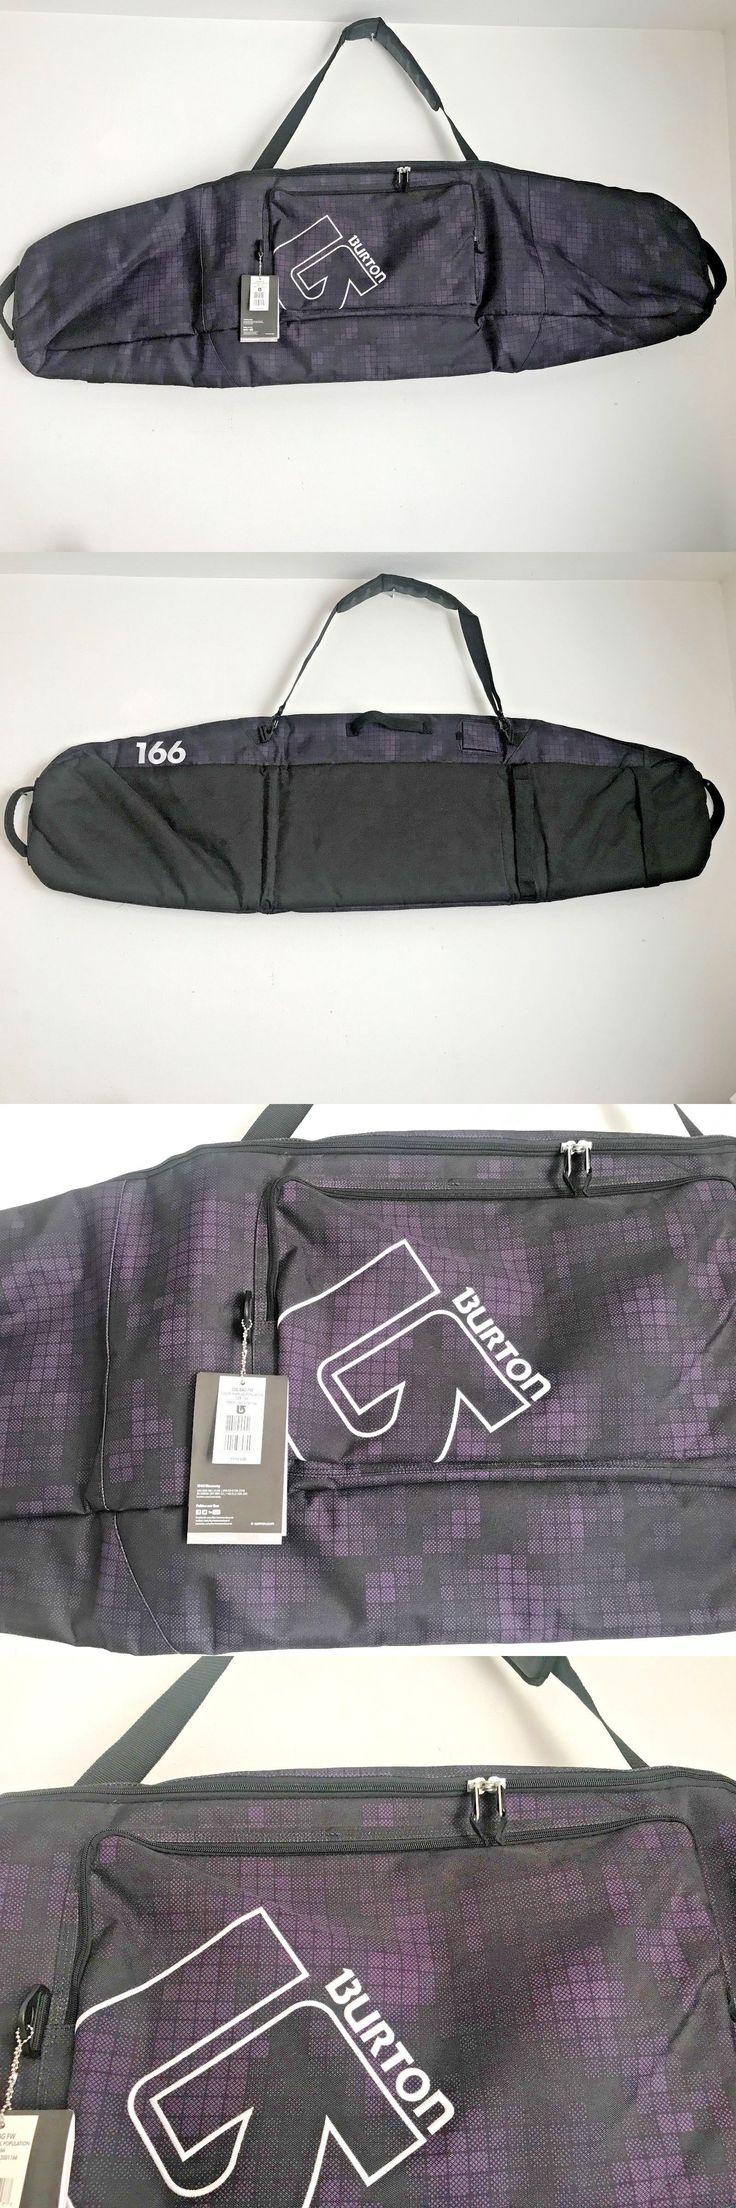 Other Snowboarding 159155: New Gig Bag Snowboard Bag Ski Bag 2016 Burton Purple 166 -> BUY IT NOW ONLY: $49.99 on eBay!